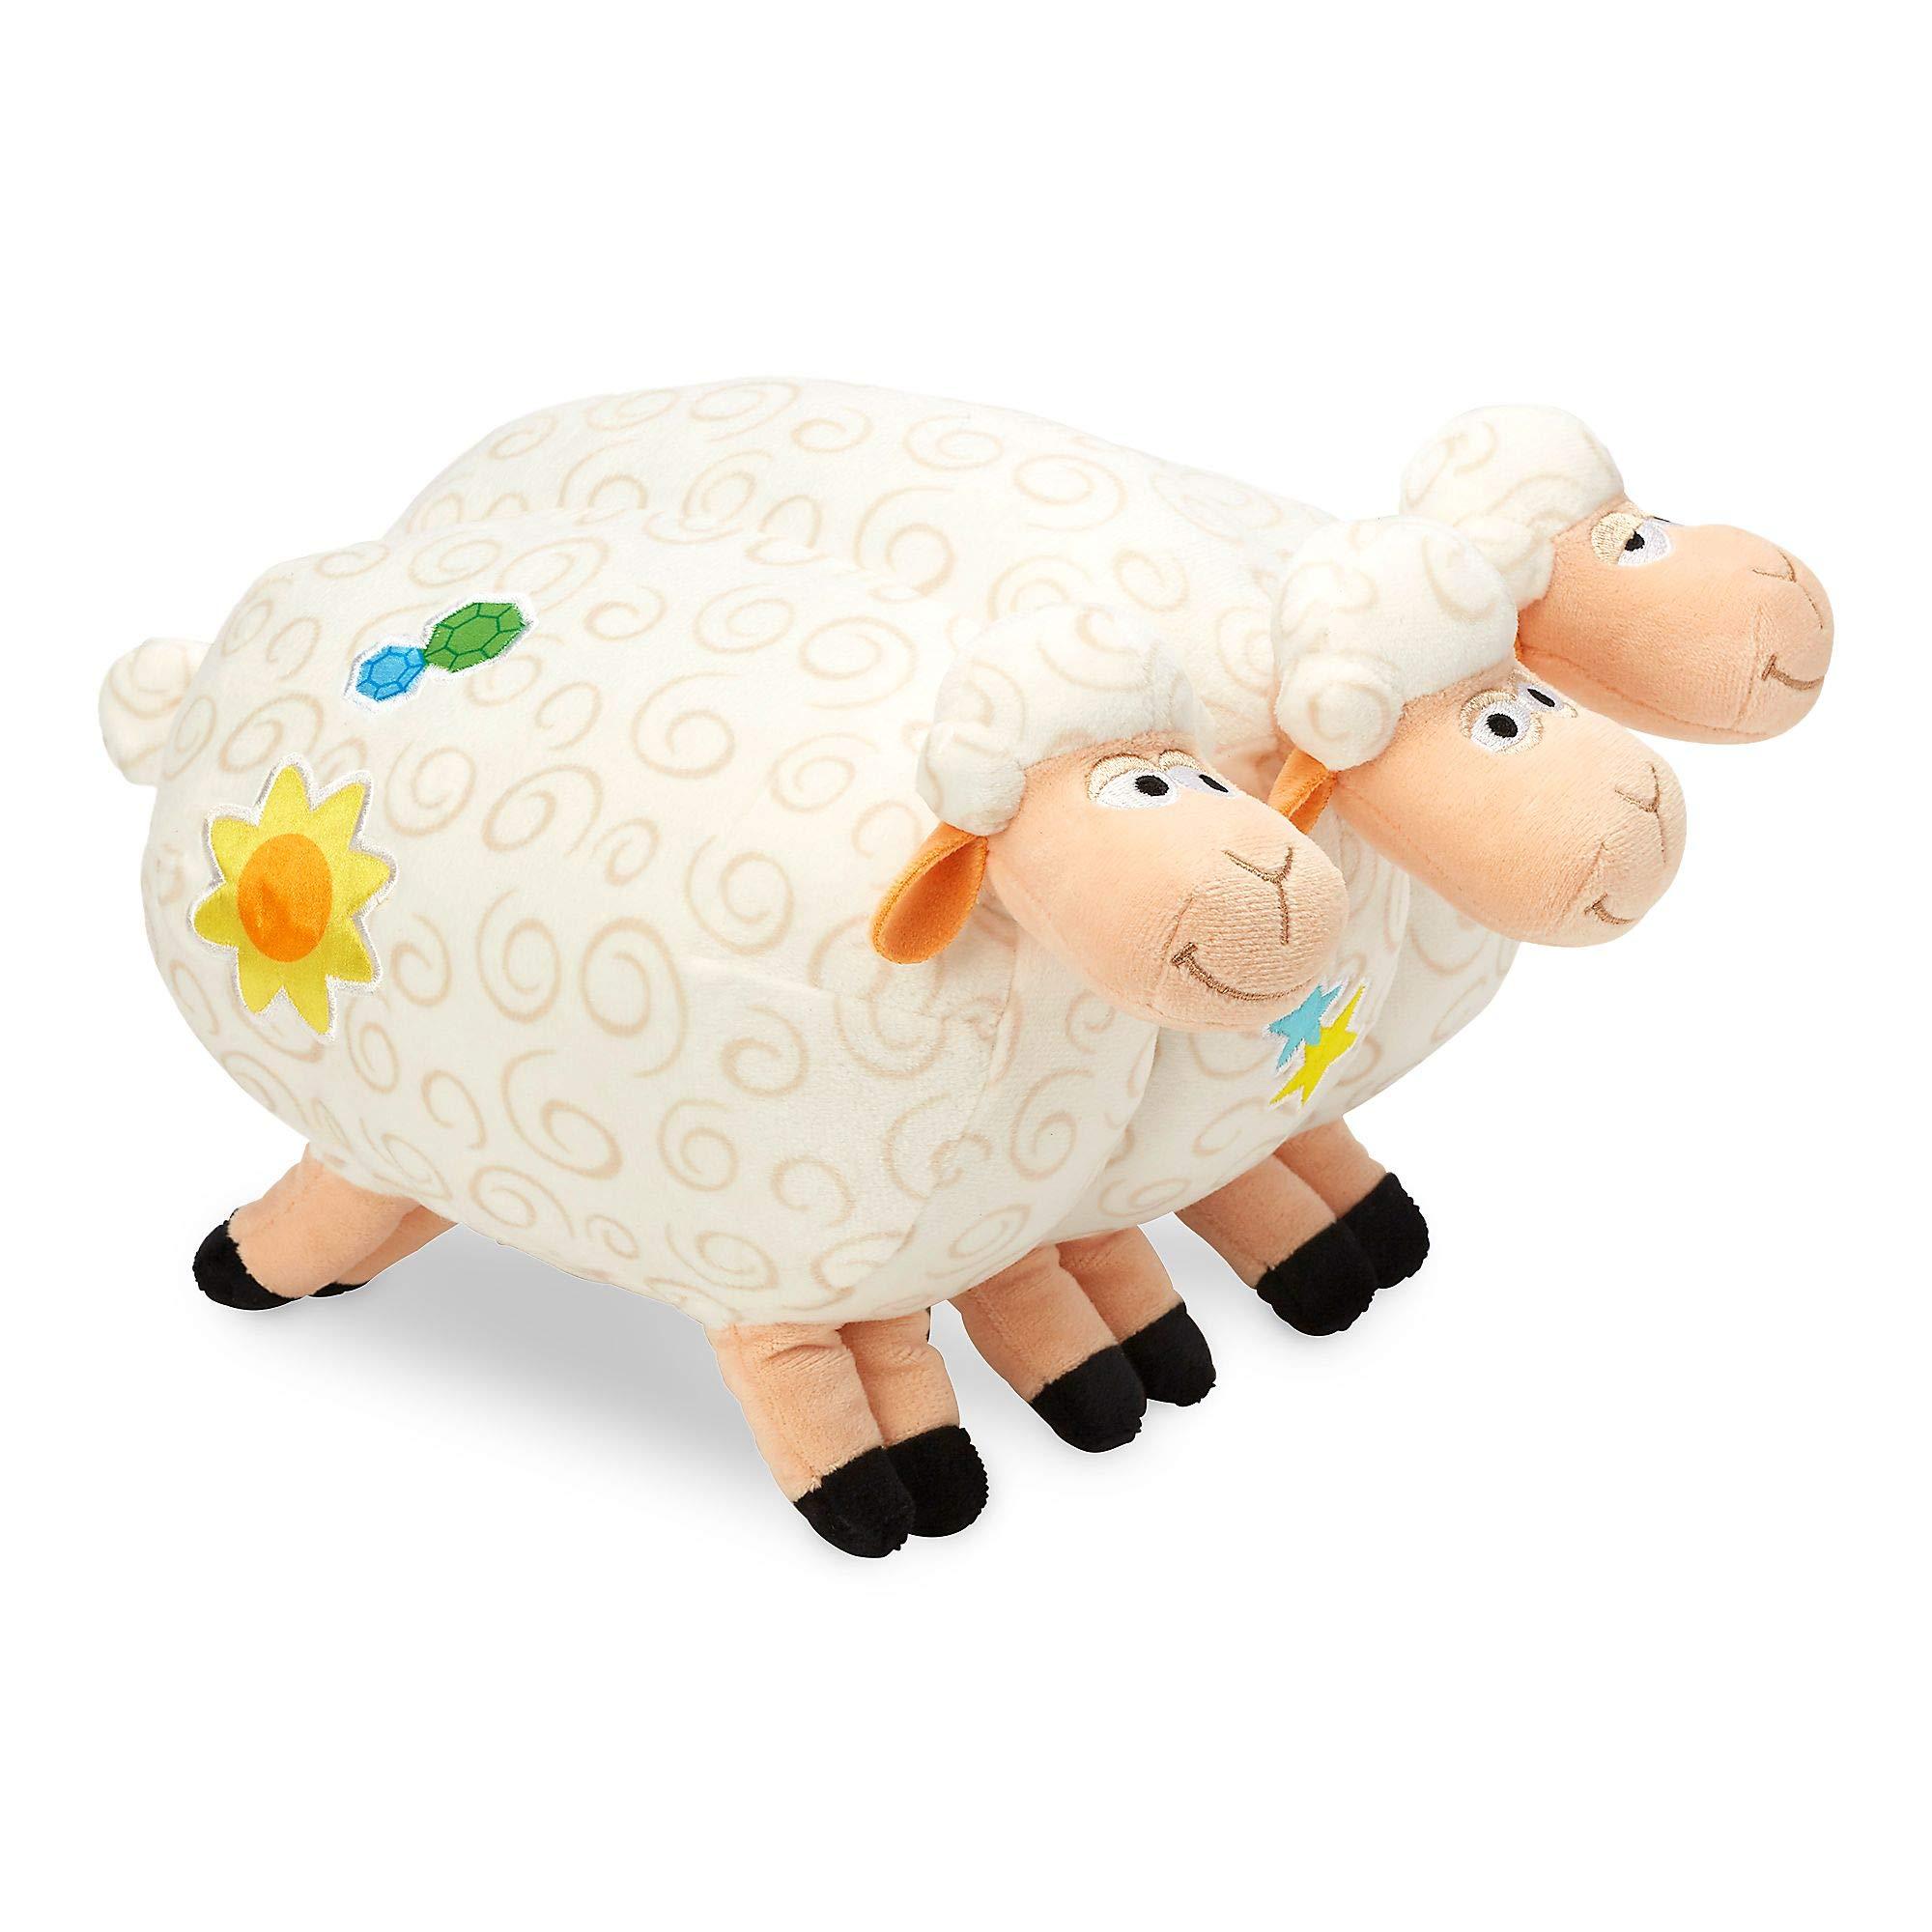 Peluche blando oficial Disney Toy Story 4 Billy, Goat y Gruff Soft ...